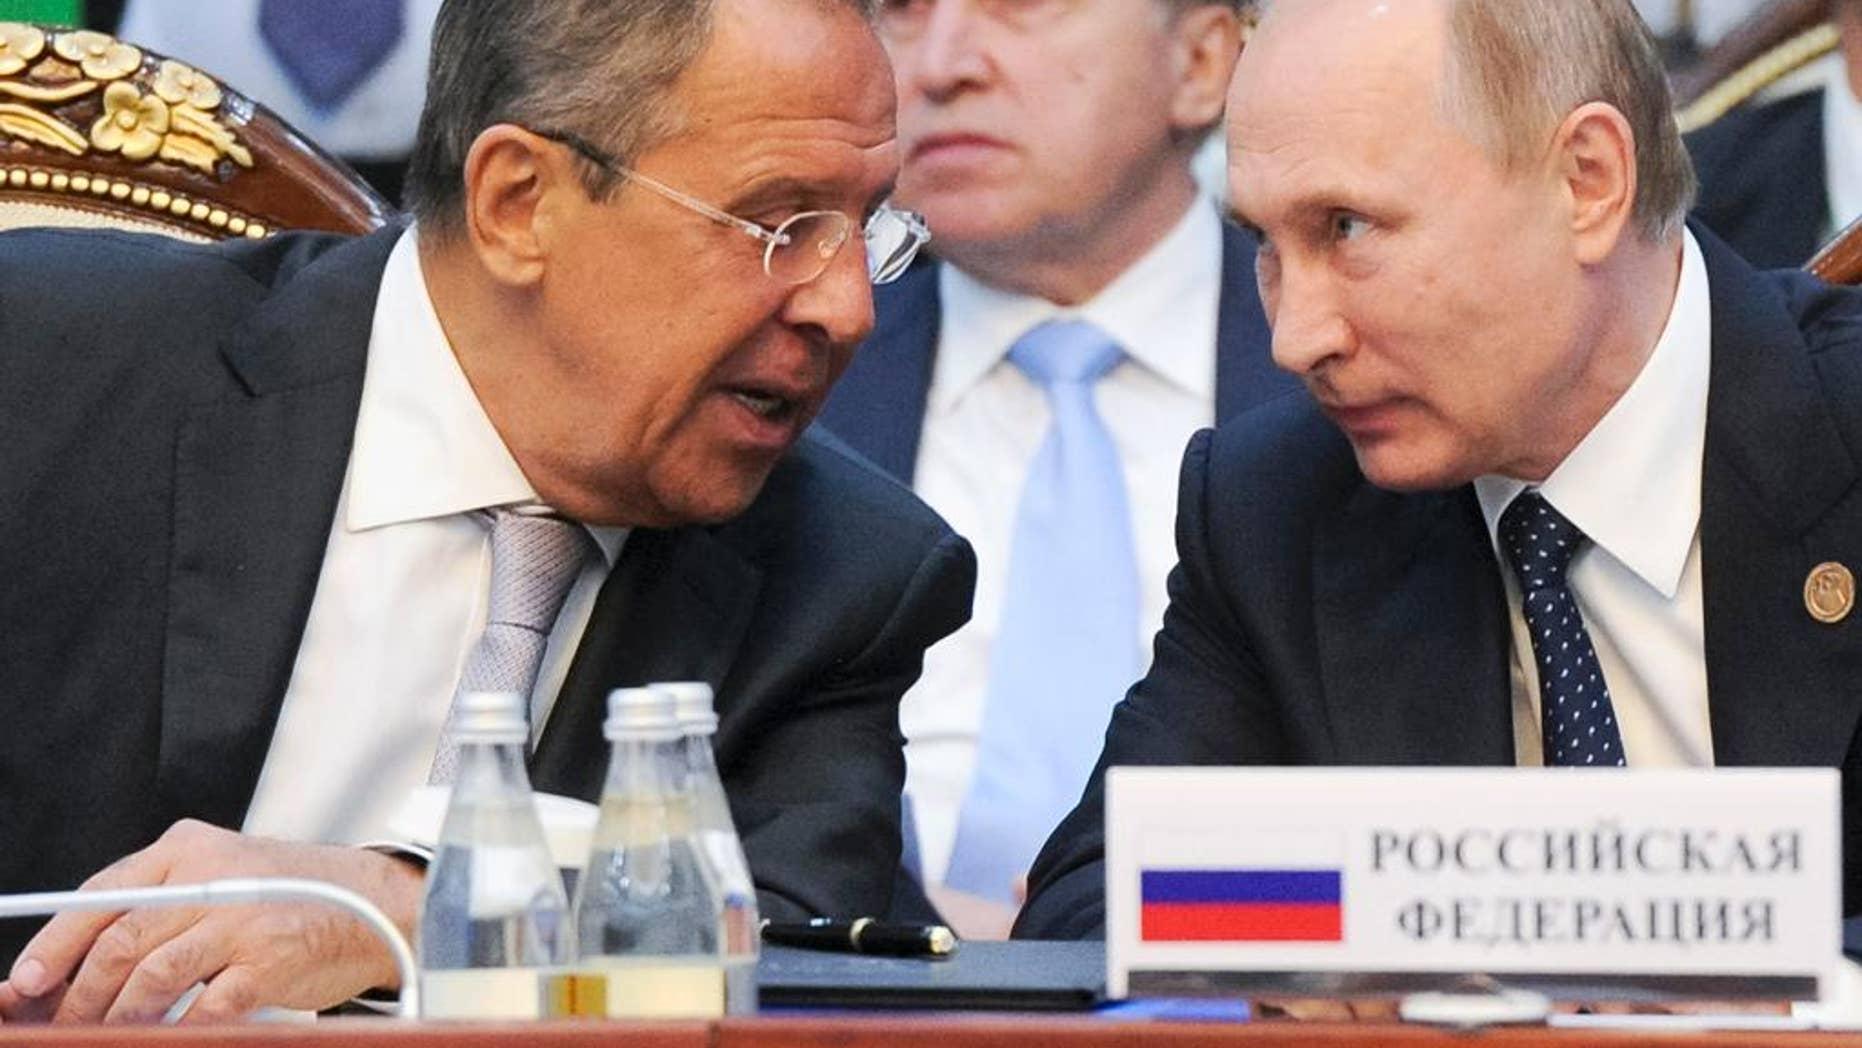 Russian President Vladimir Putin, right, and Russian Foreign Minister Sergey Lavrov speak each other at a CIS (Commonwealth of Independent States, former Soviet republics) summit in Bishkek, Kyrgyzstan, Saturday, Sept. 17, 2016. (Mikhail Klimentyev/Sputnik, Kremlin Pool Photo via AP)